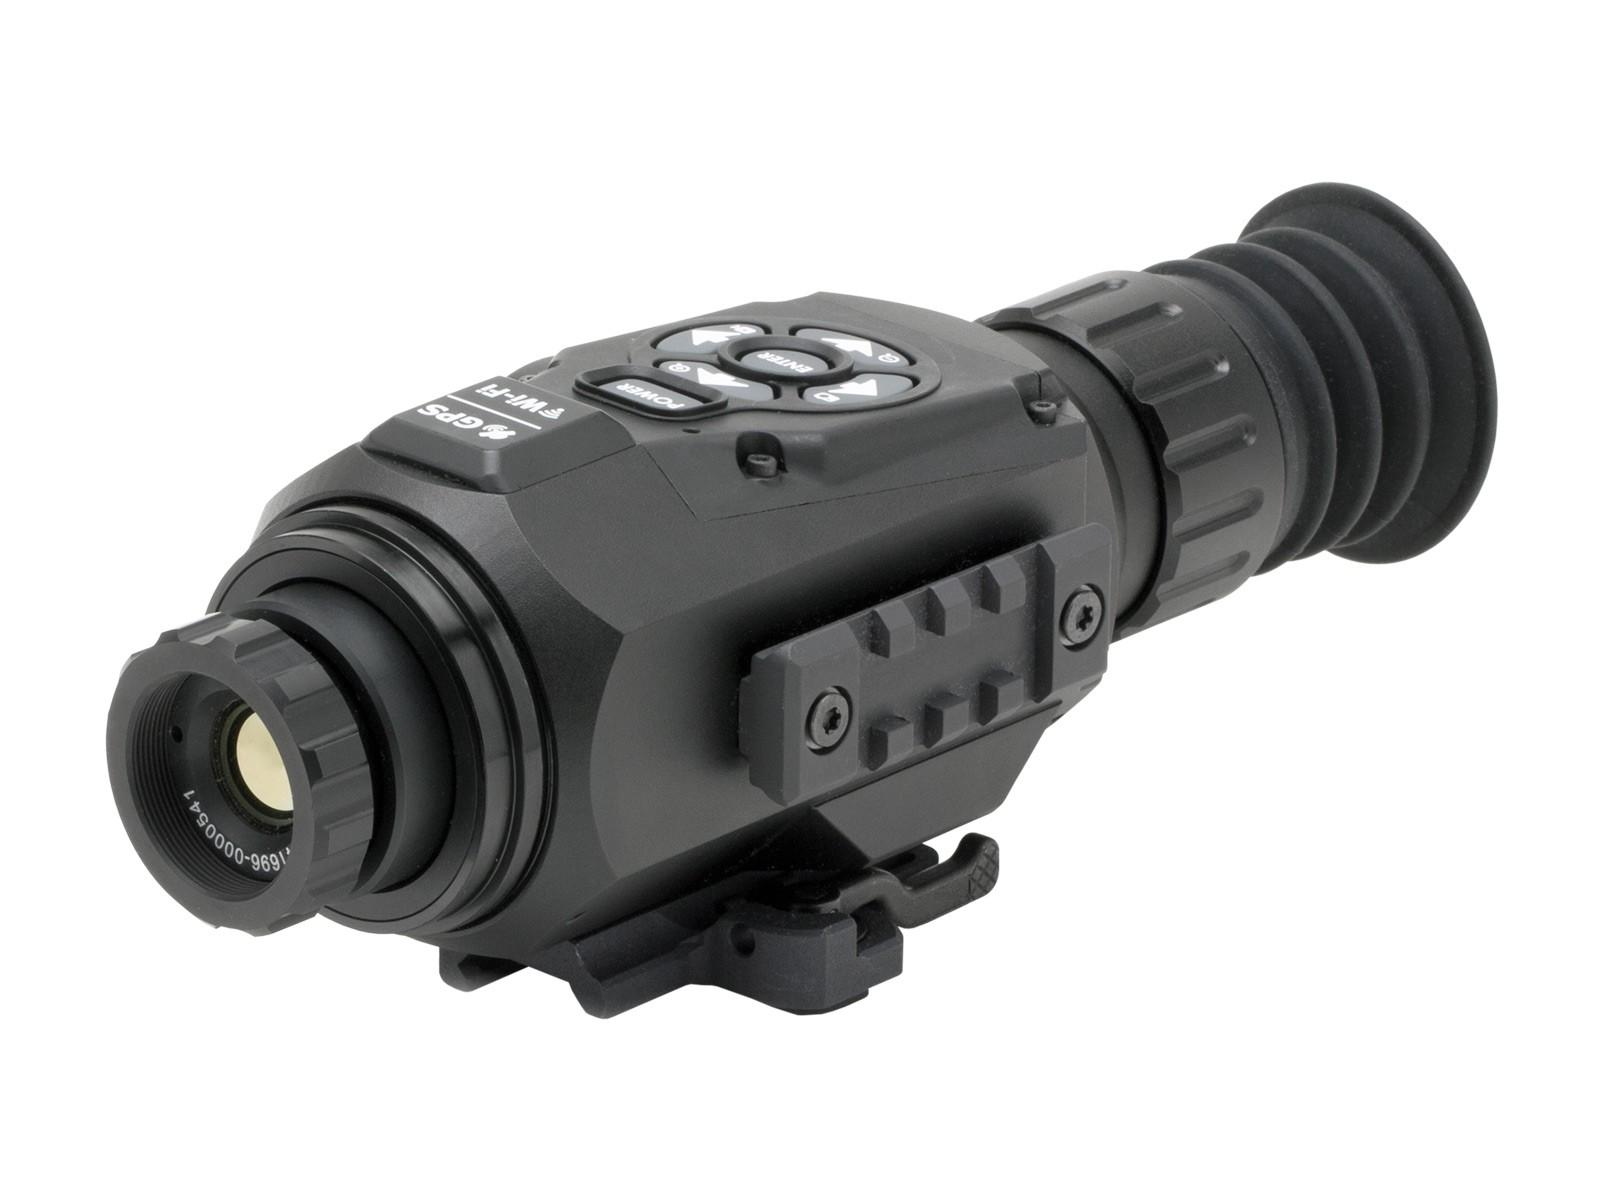 ATN Thor-HD384 1 25-5x Thermal Rifle Scope